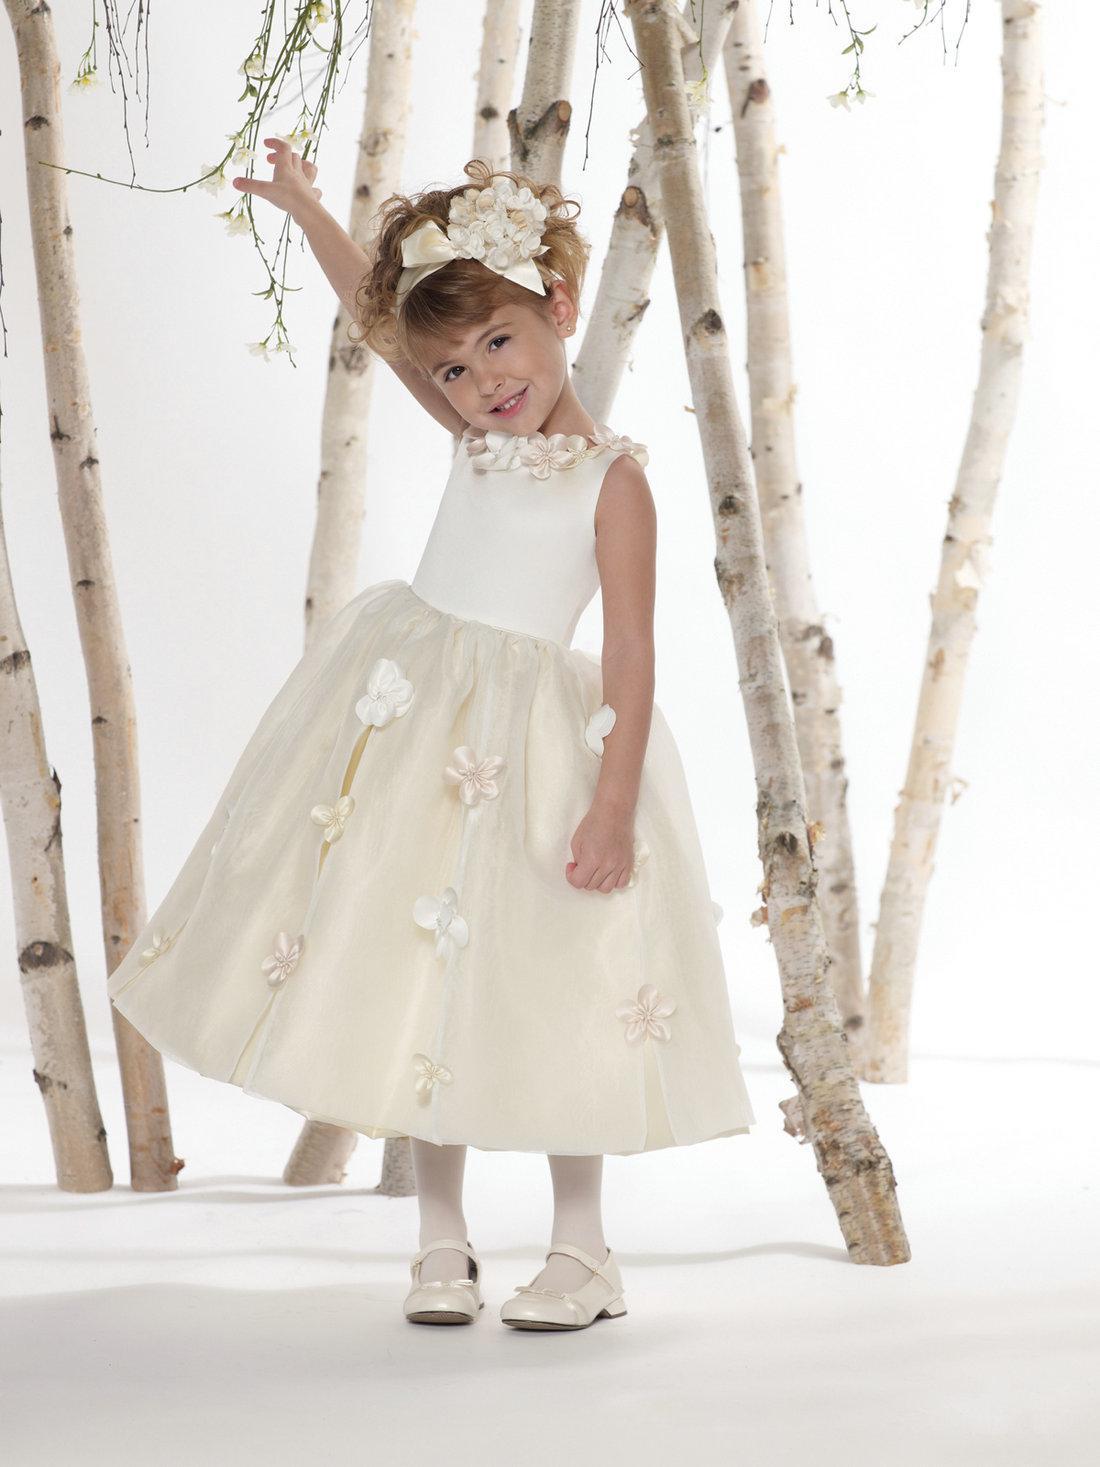 Cute Flower Girl Dresses Coupon Code Citroen C2 Leasing Deals